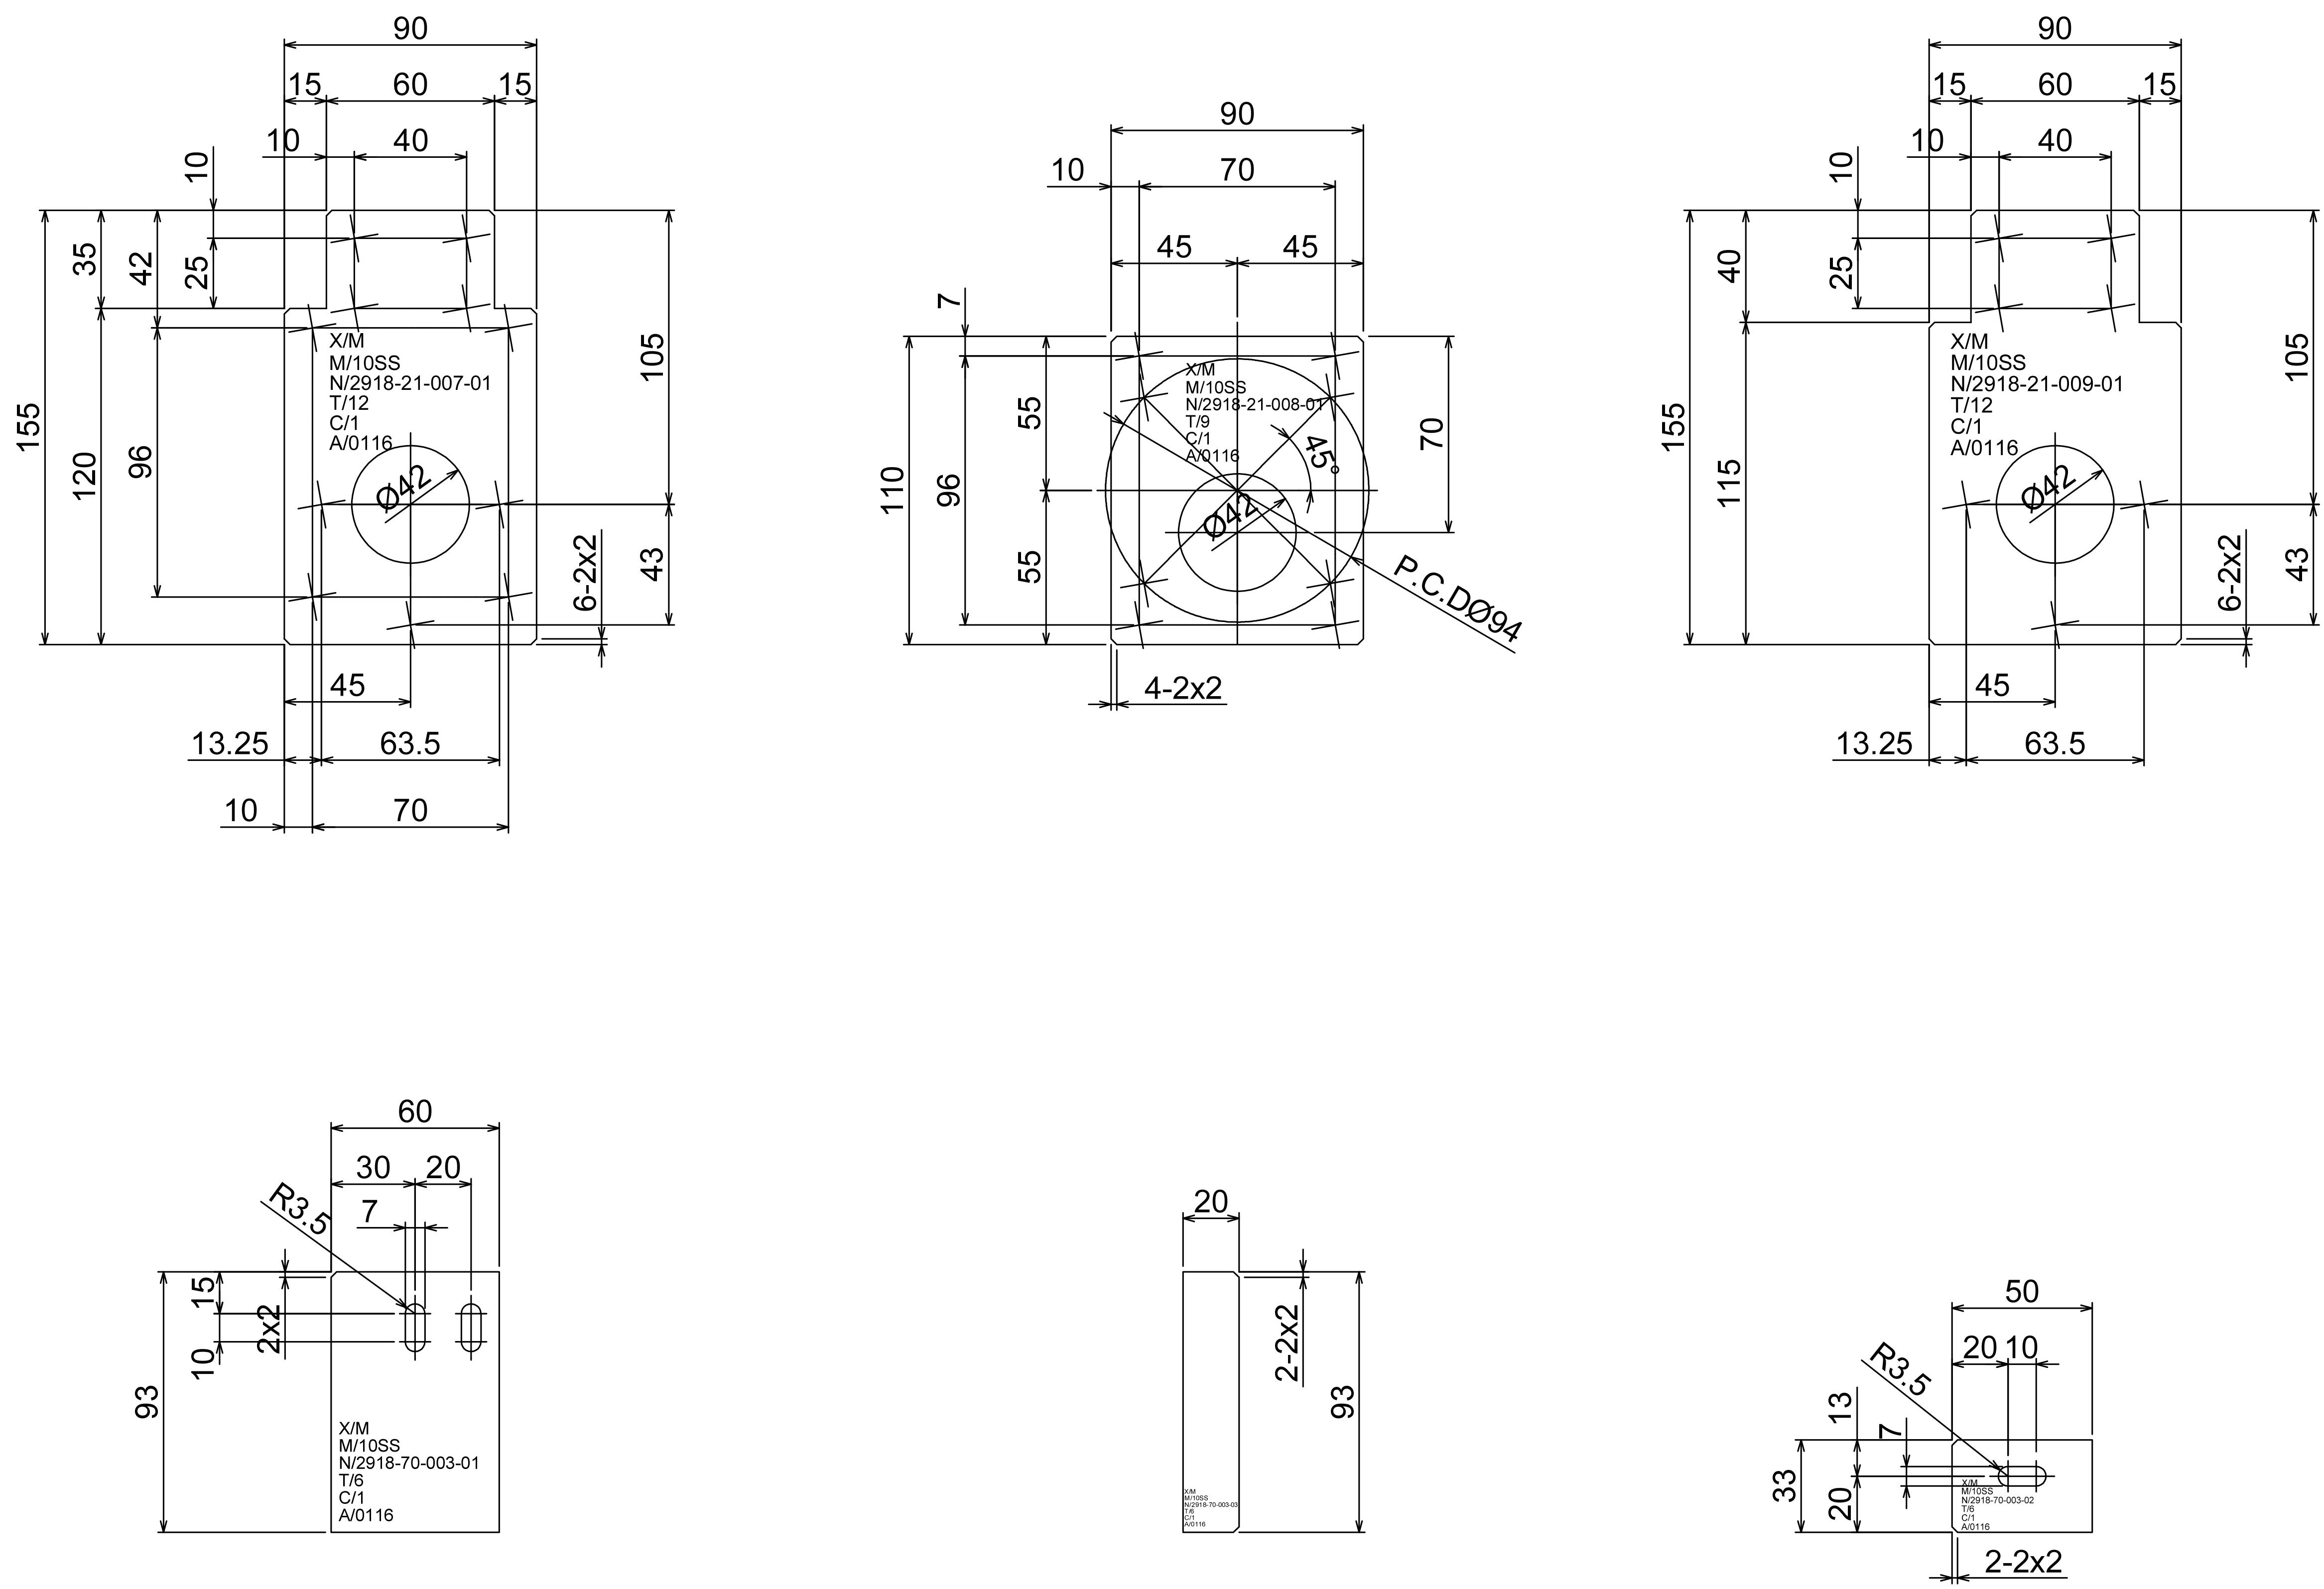 Phần mềm, kỹ thuật: CAD, D-CAD